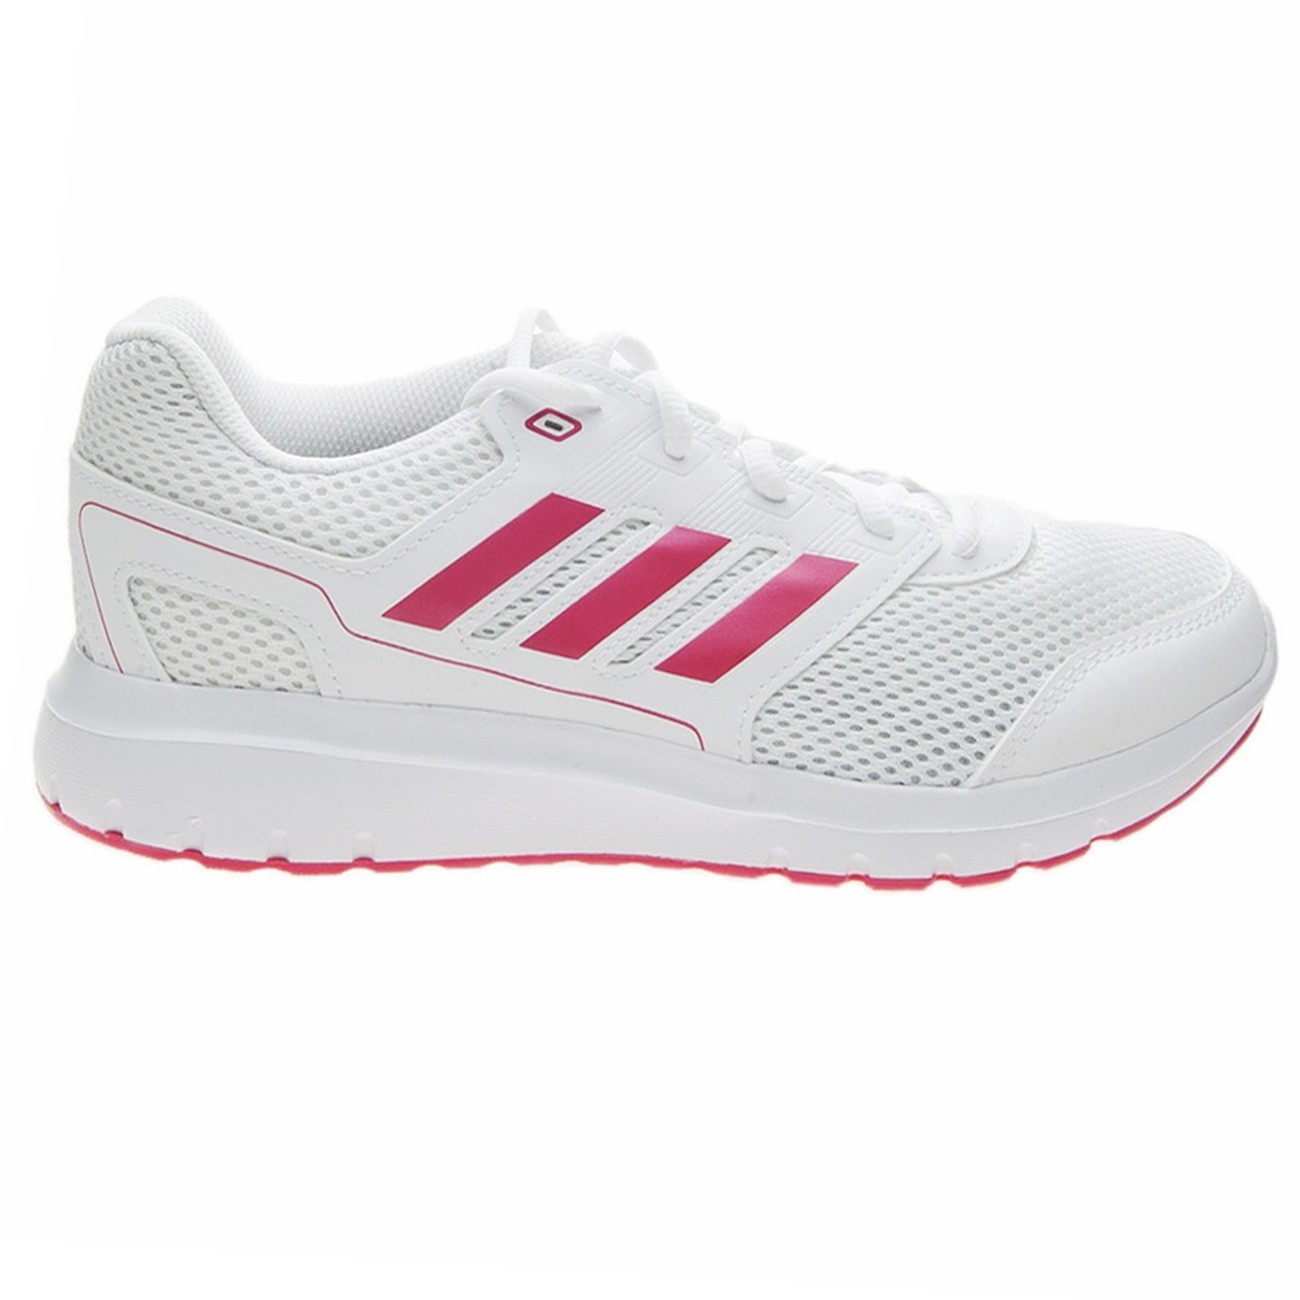 Running shoes Adidas Duramo Lite 2.0 Woman - Sporty shoes